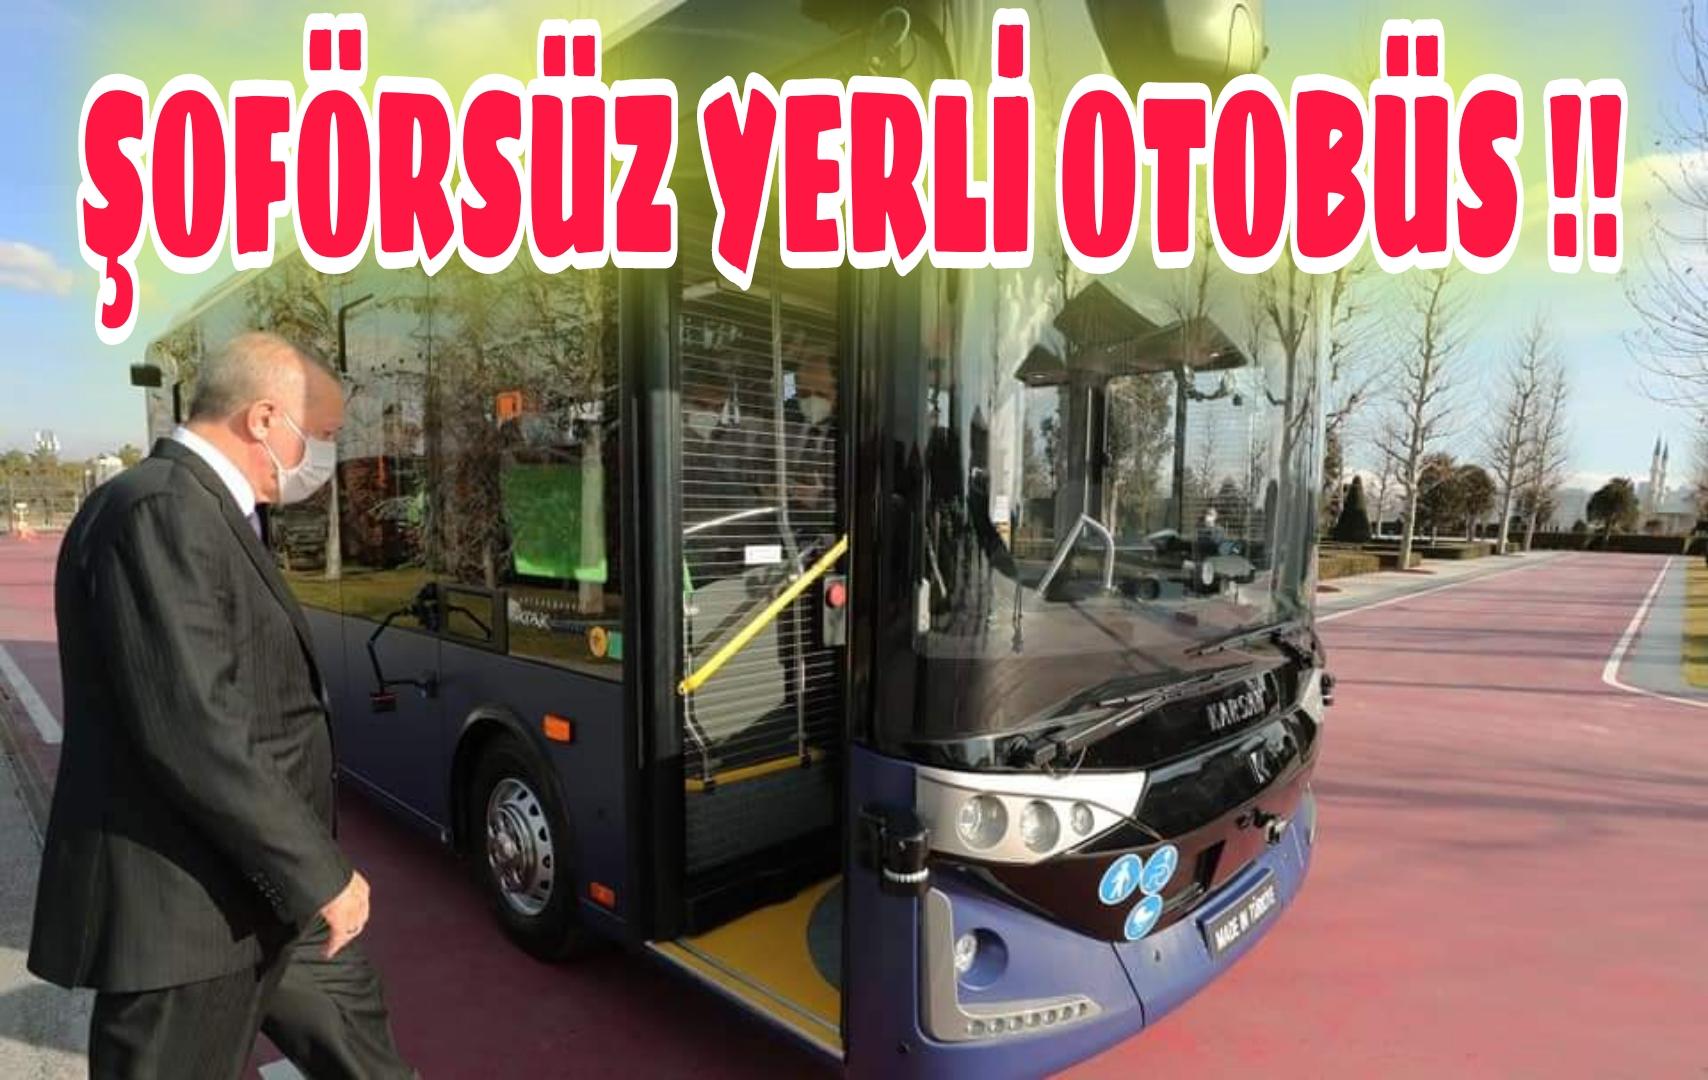 %100 YERLİ ELEKTRİKLİ ŞOFÖRSÜZ OTOBÜS !!